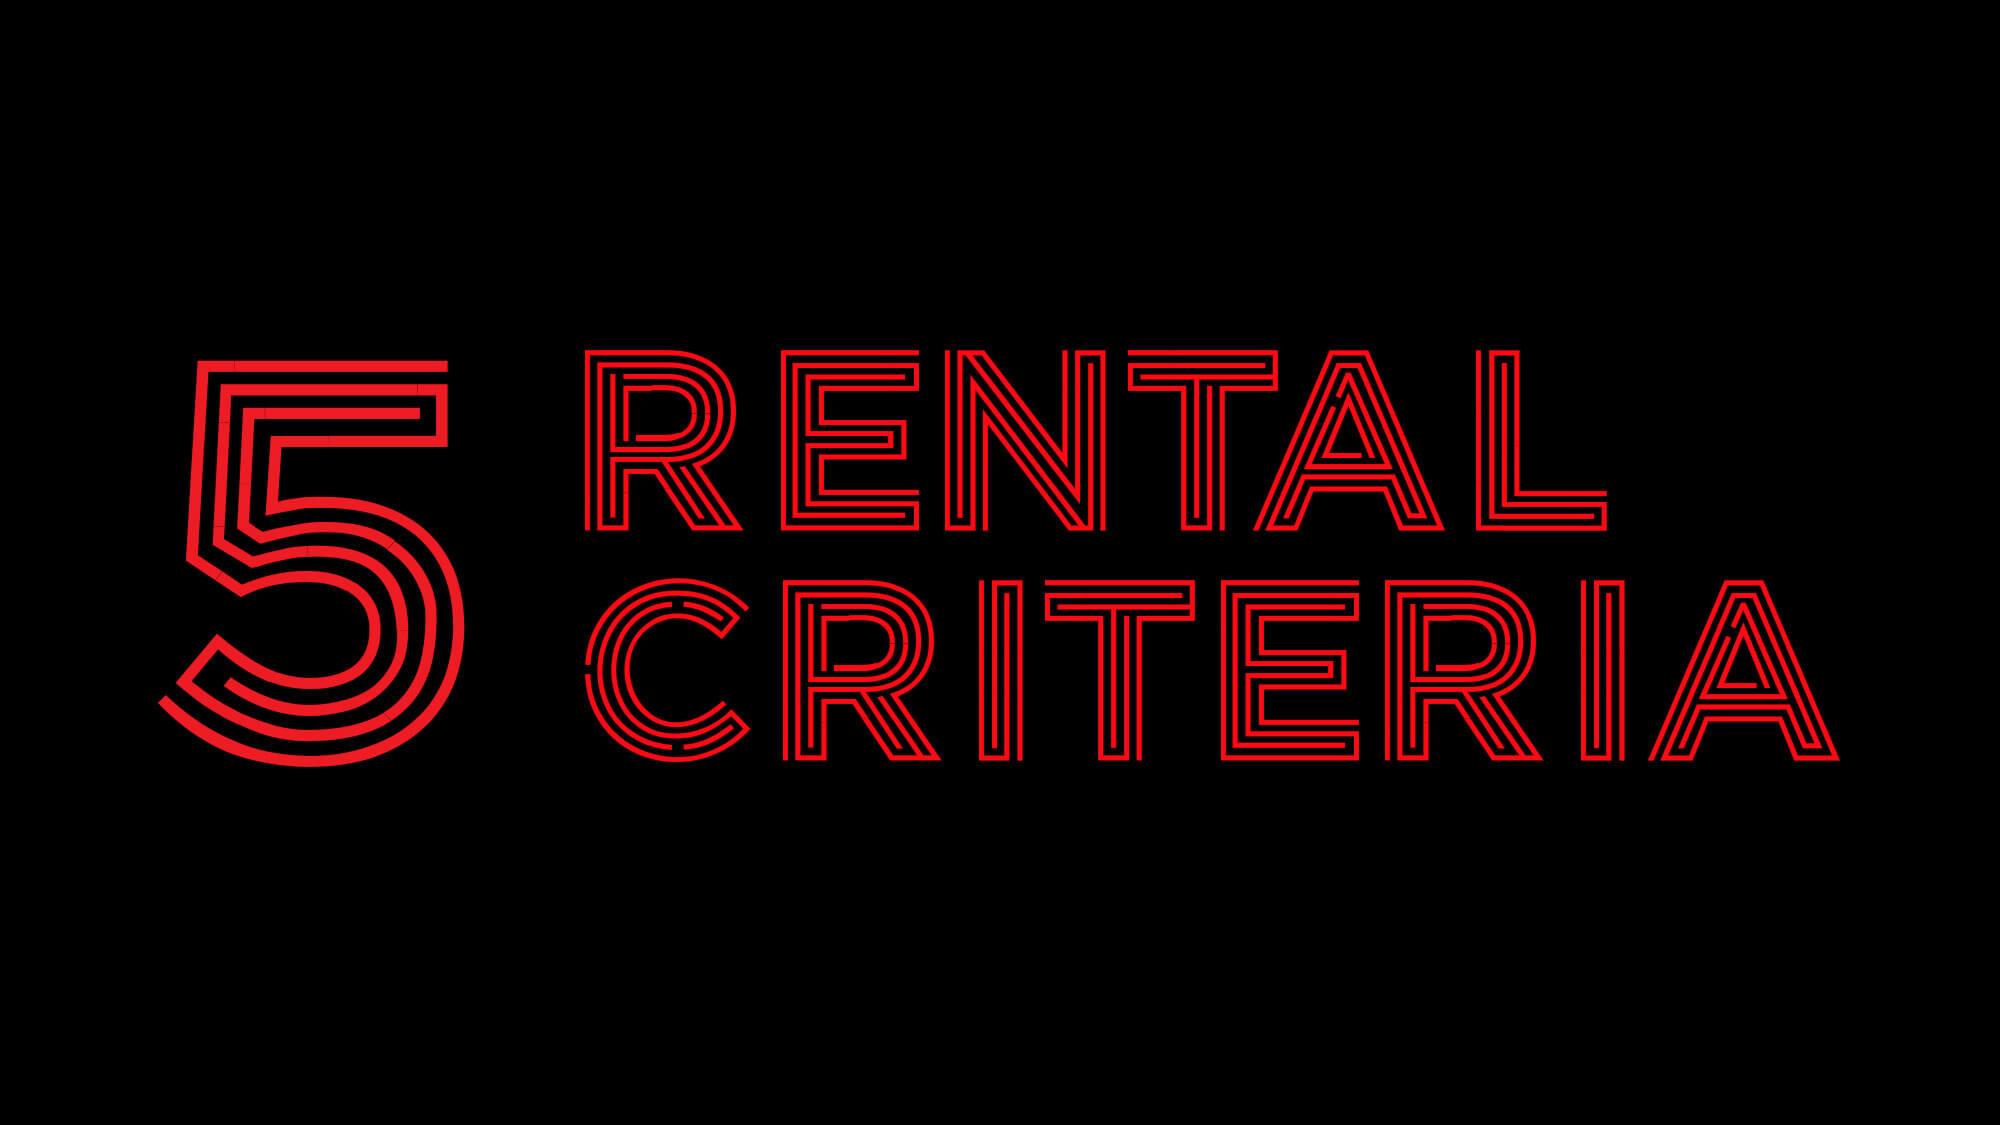 Rental Criteria